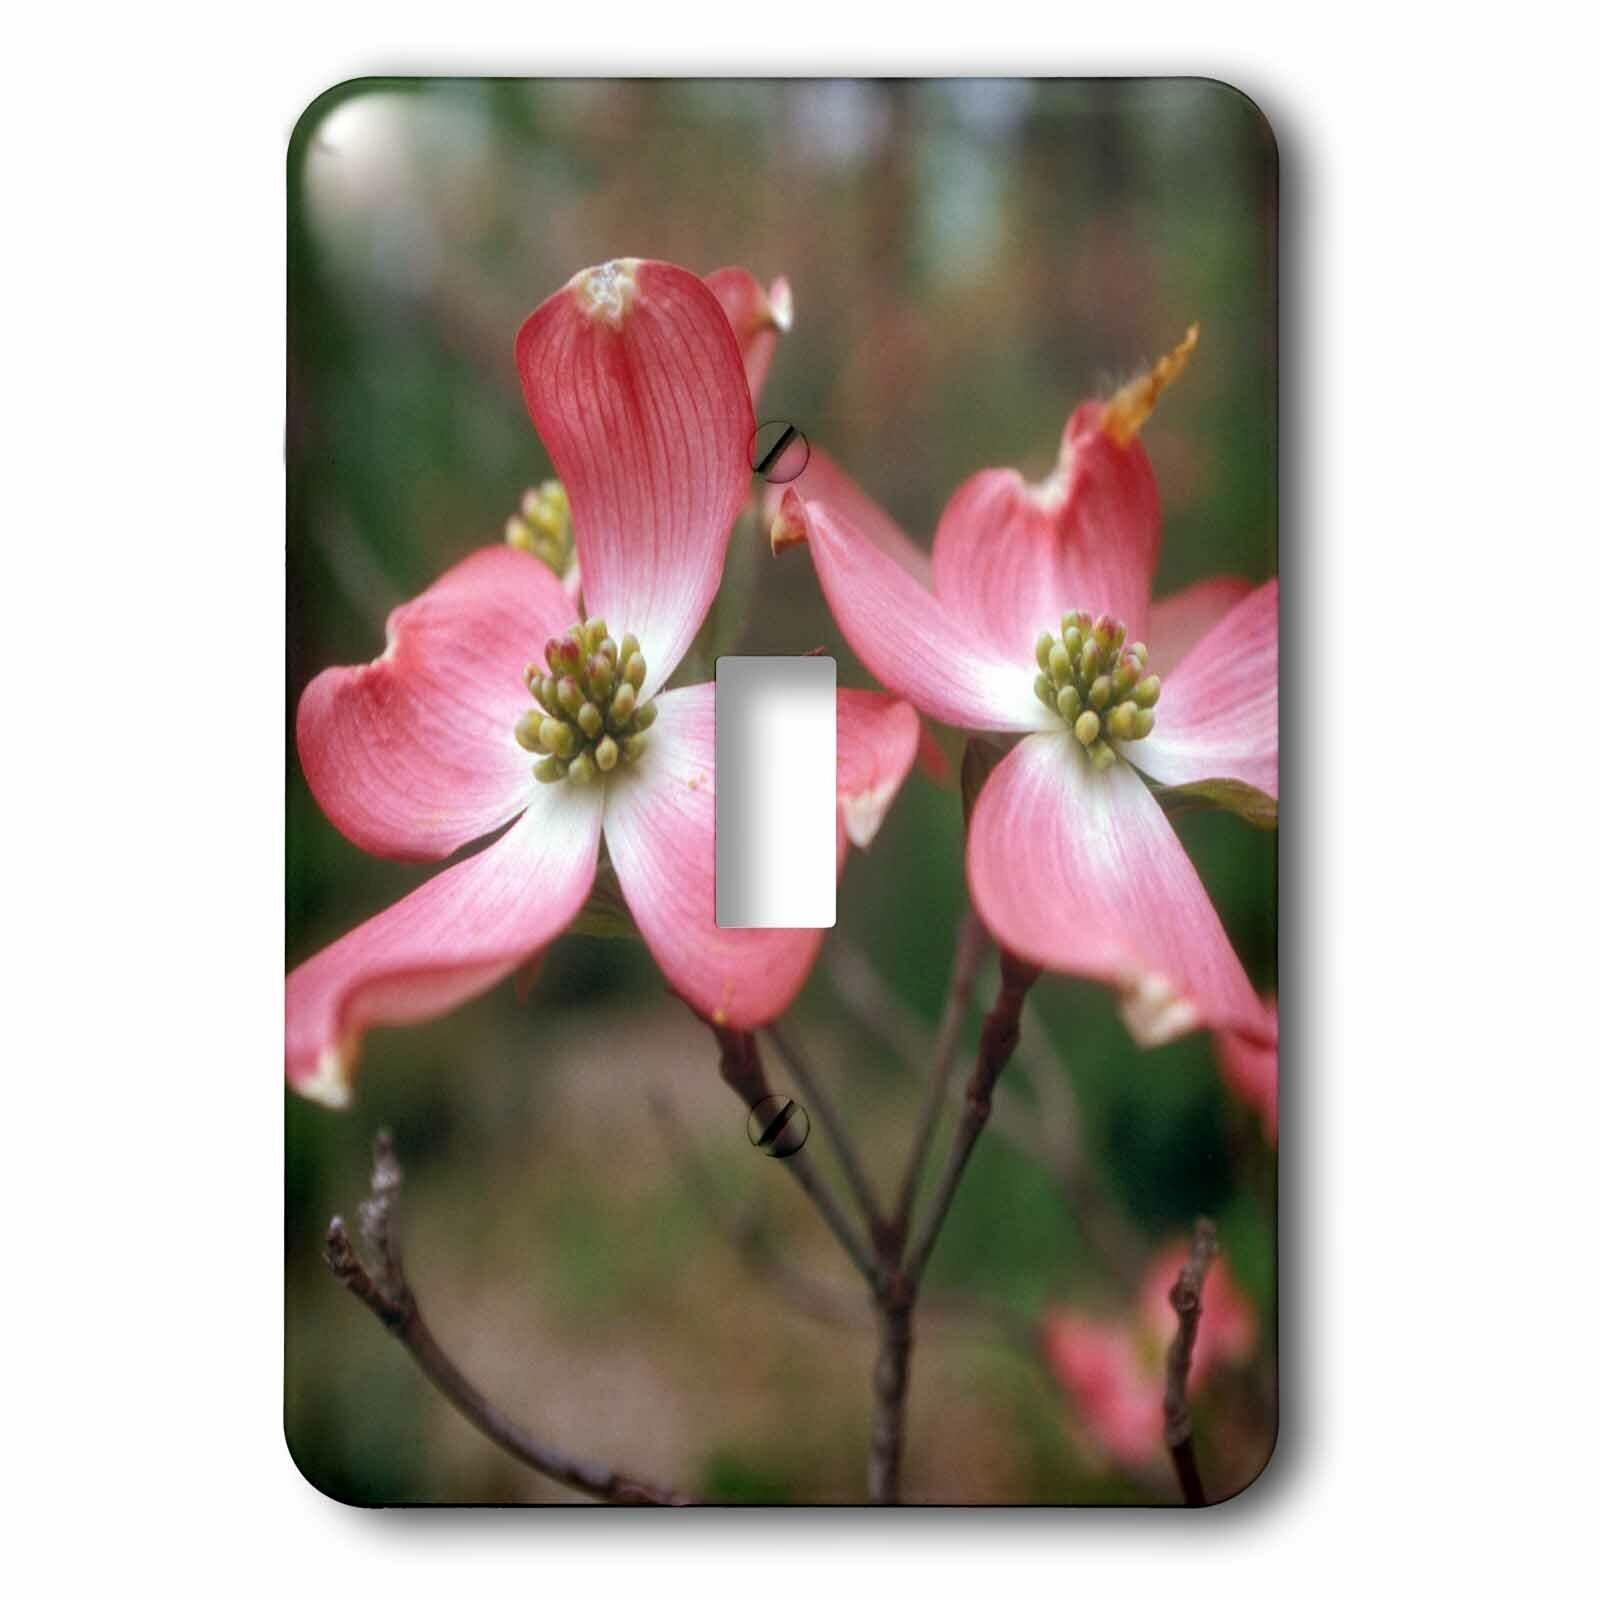 3drose Dogwood Blooming 1 Gang Toggle Light Switch Wall Plate Wayfair